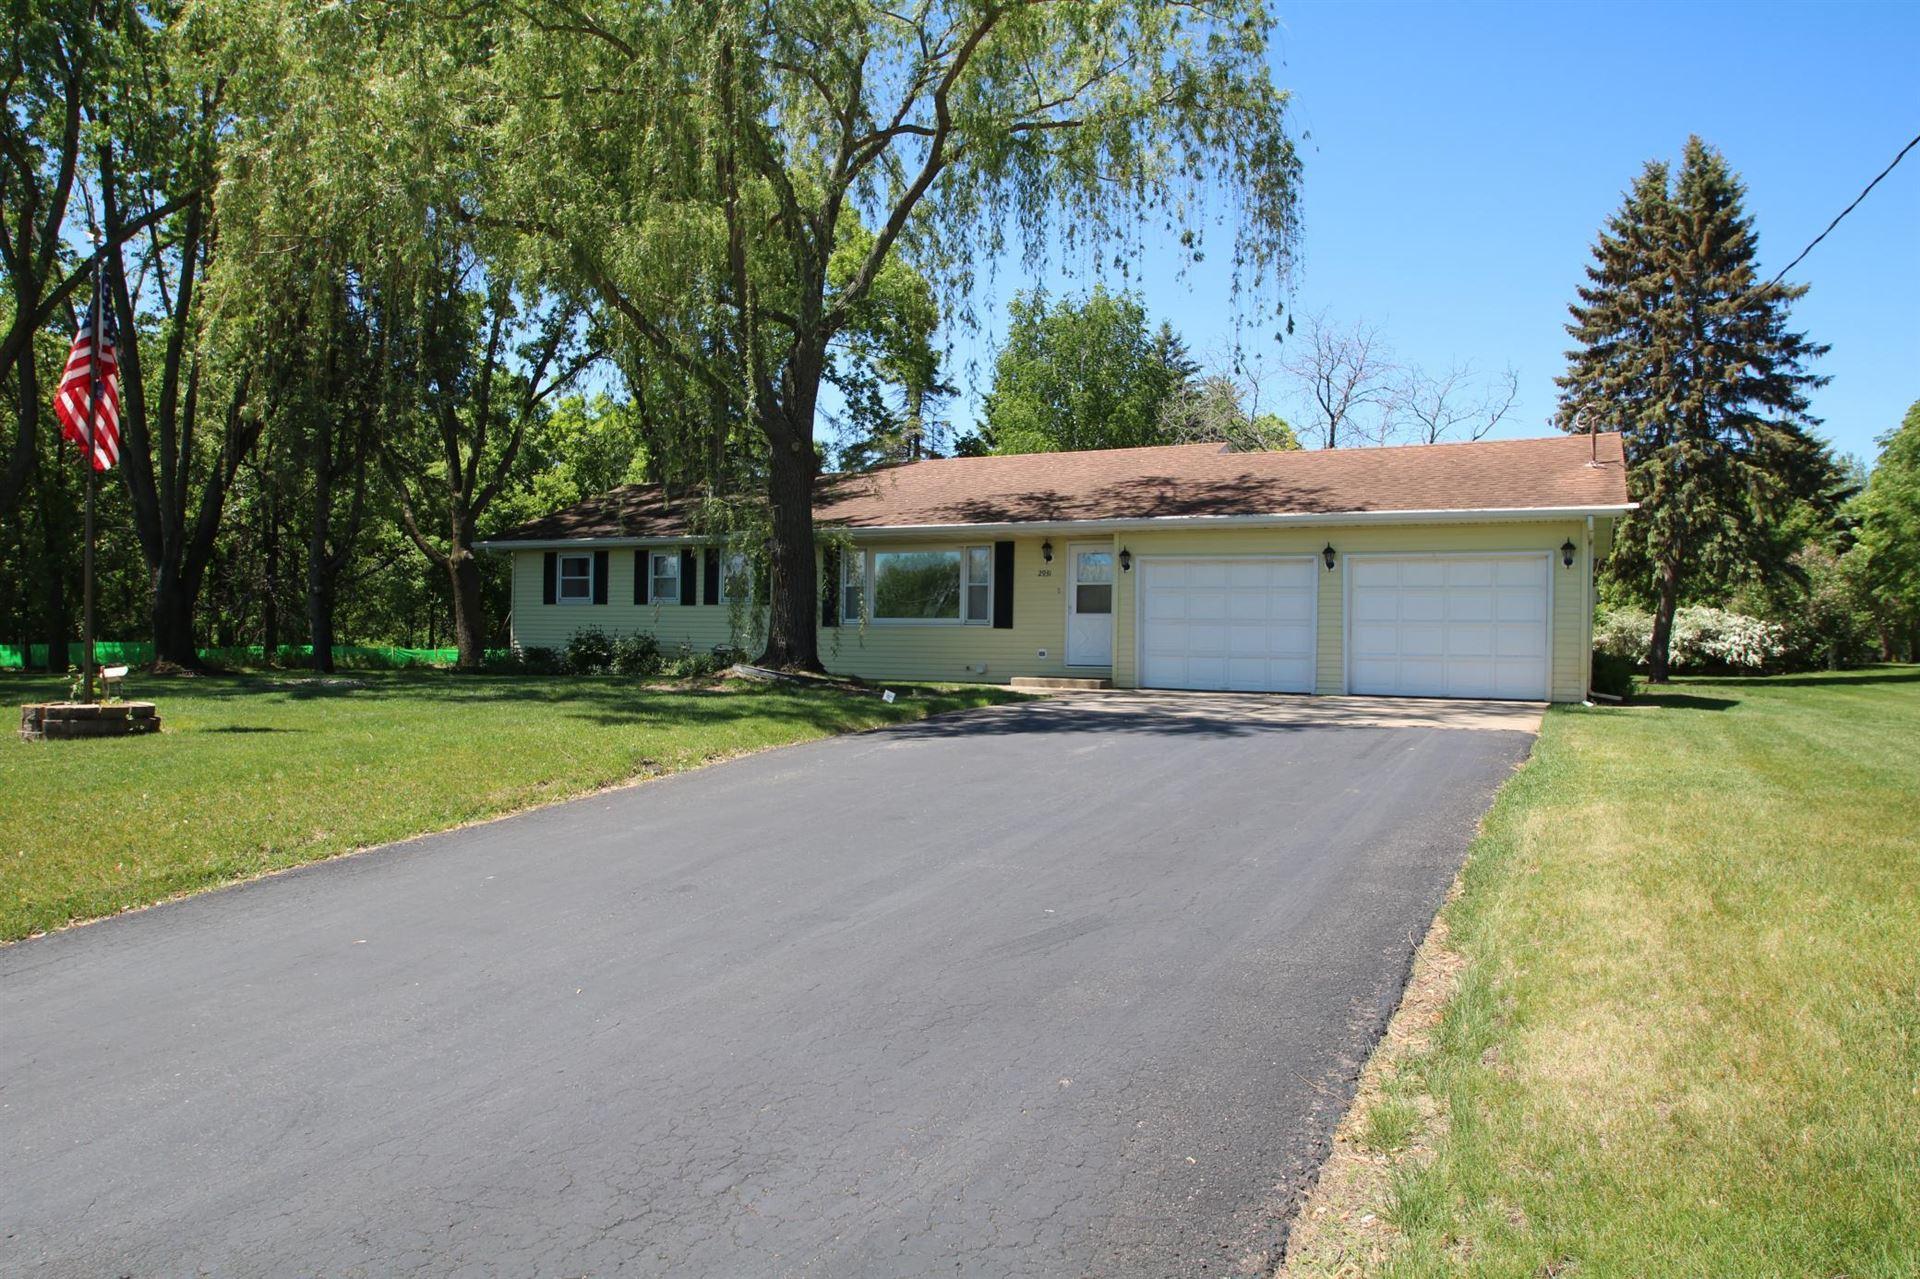 2931 Cooper Avenue S, Saint Cloud, MN 56301 - MLS#: 5760974